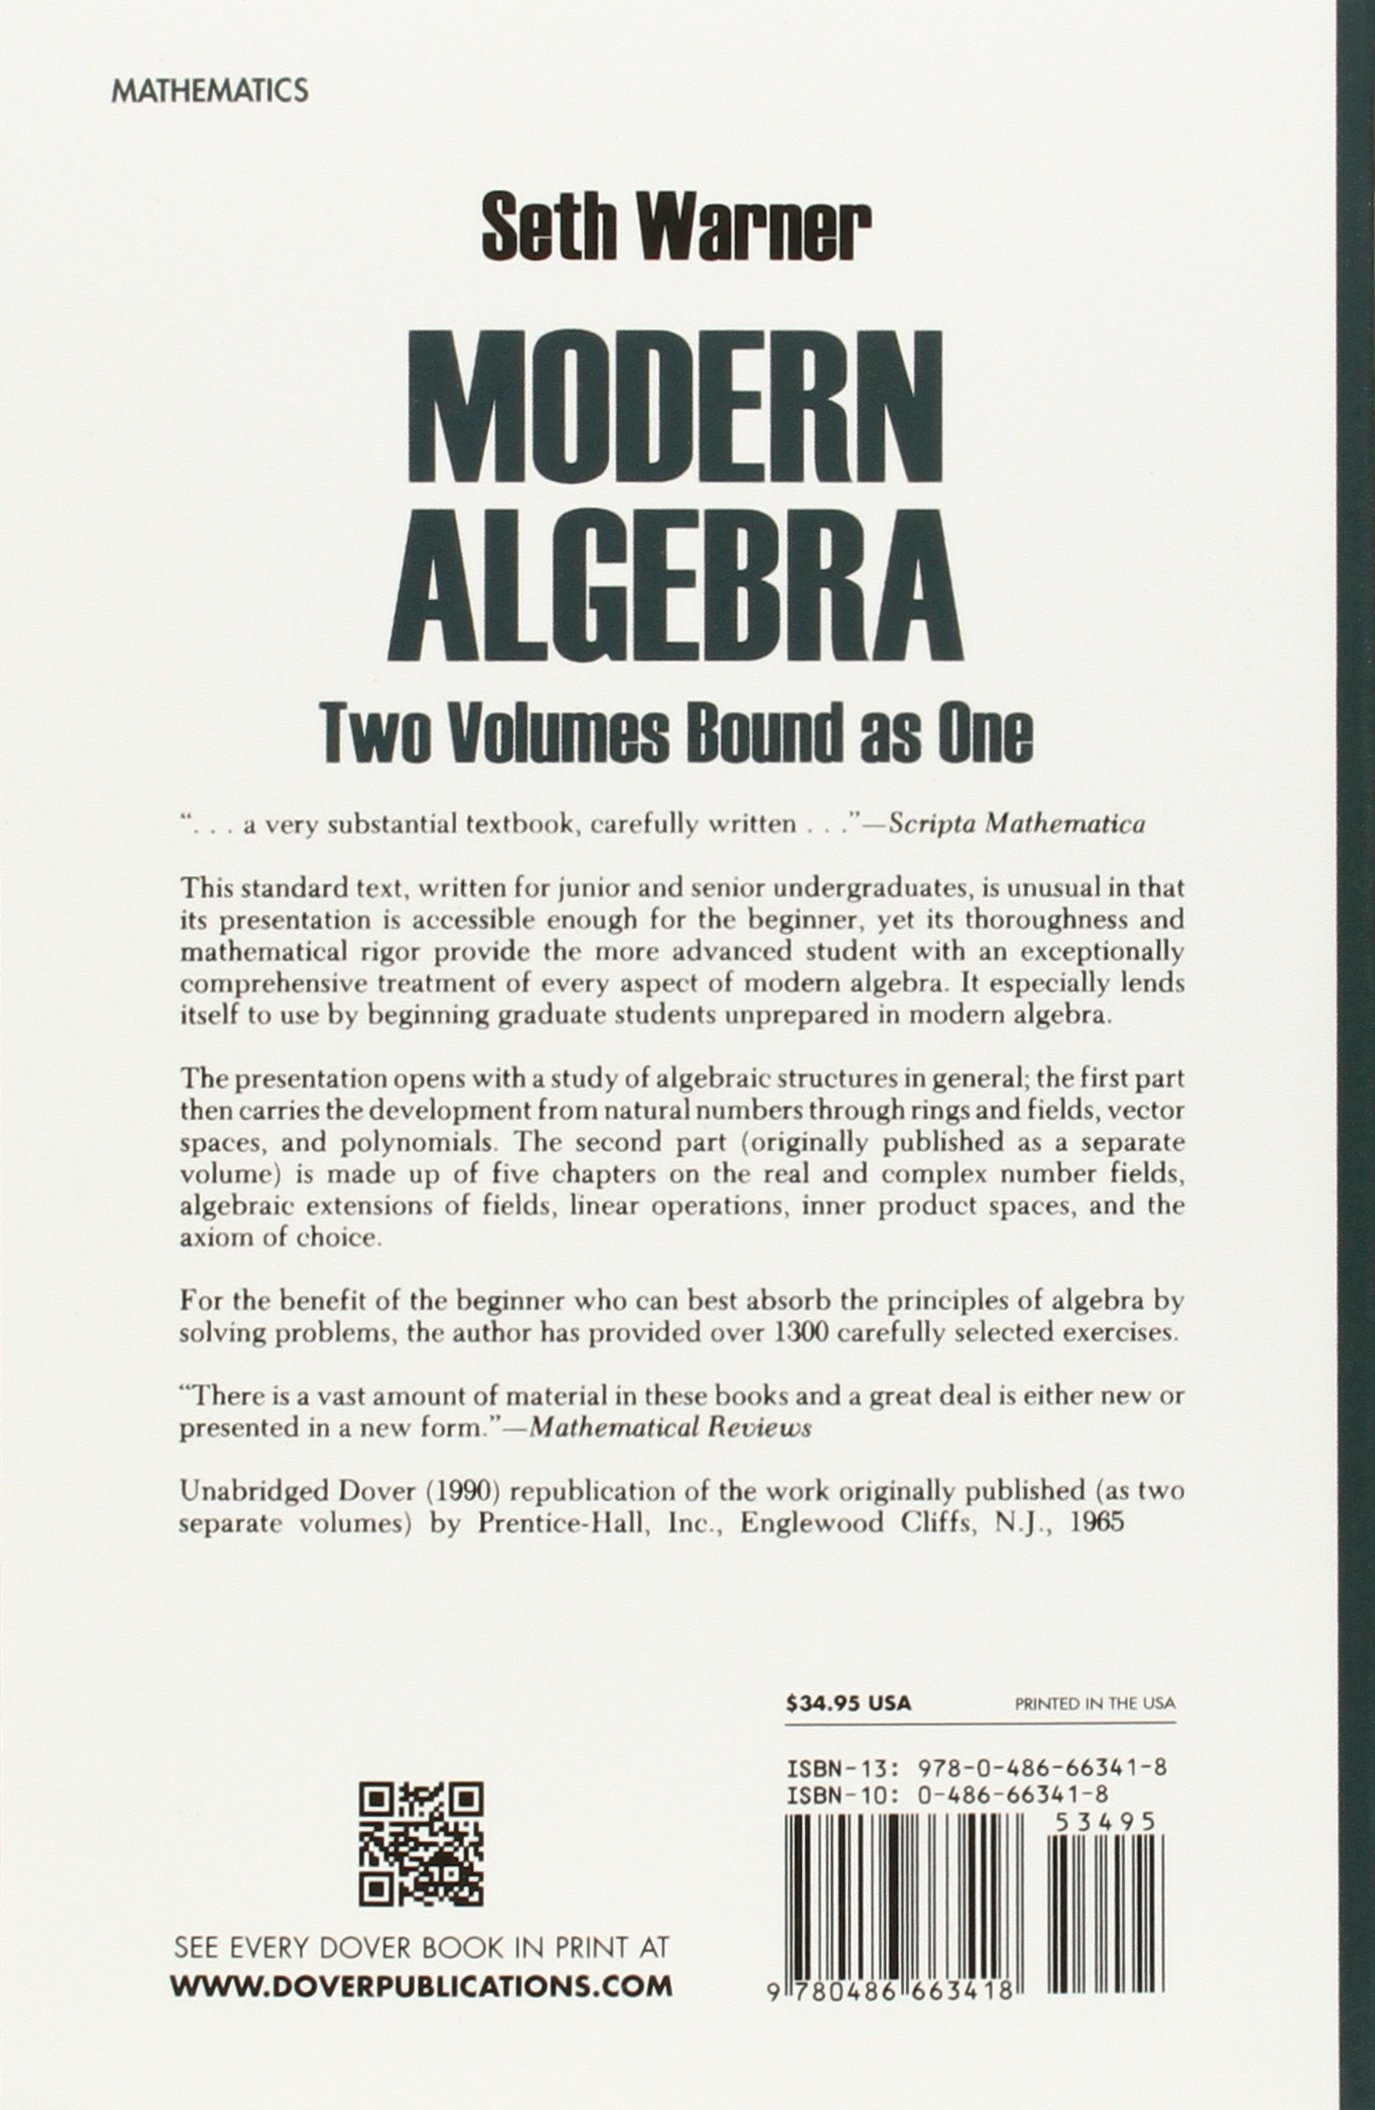 Modern algebra dover books on mathematics seth warner modern algebra dover books on mathematics seth warner mathematics 9780486663418 amazon books biocorpaavc